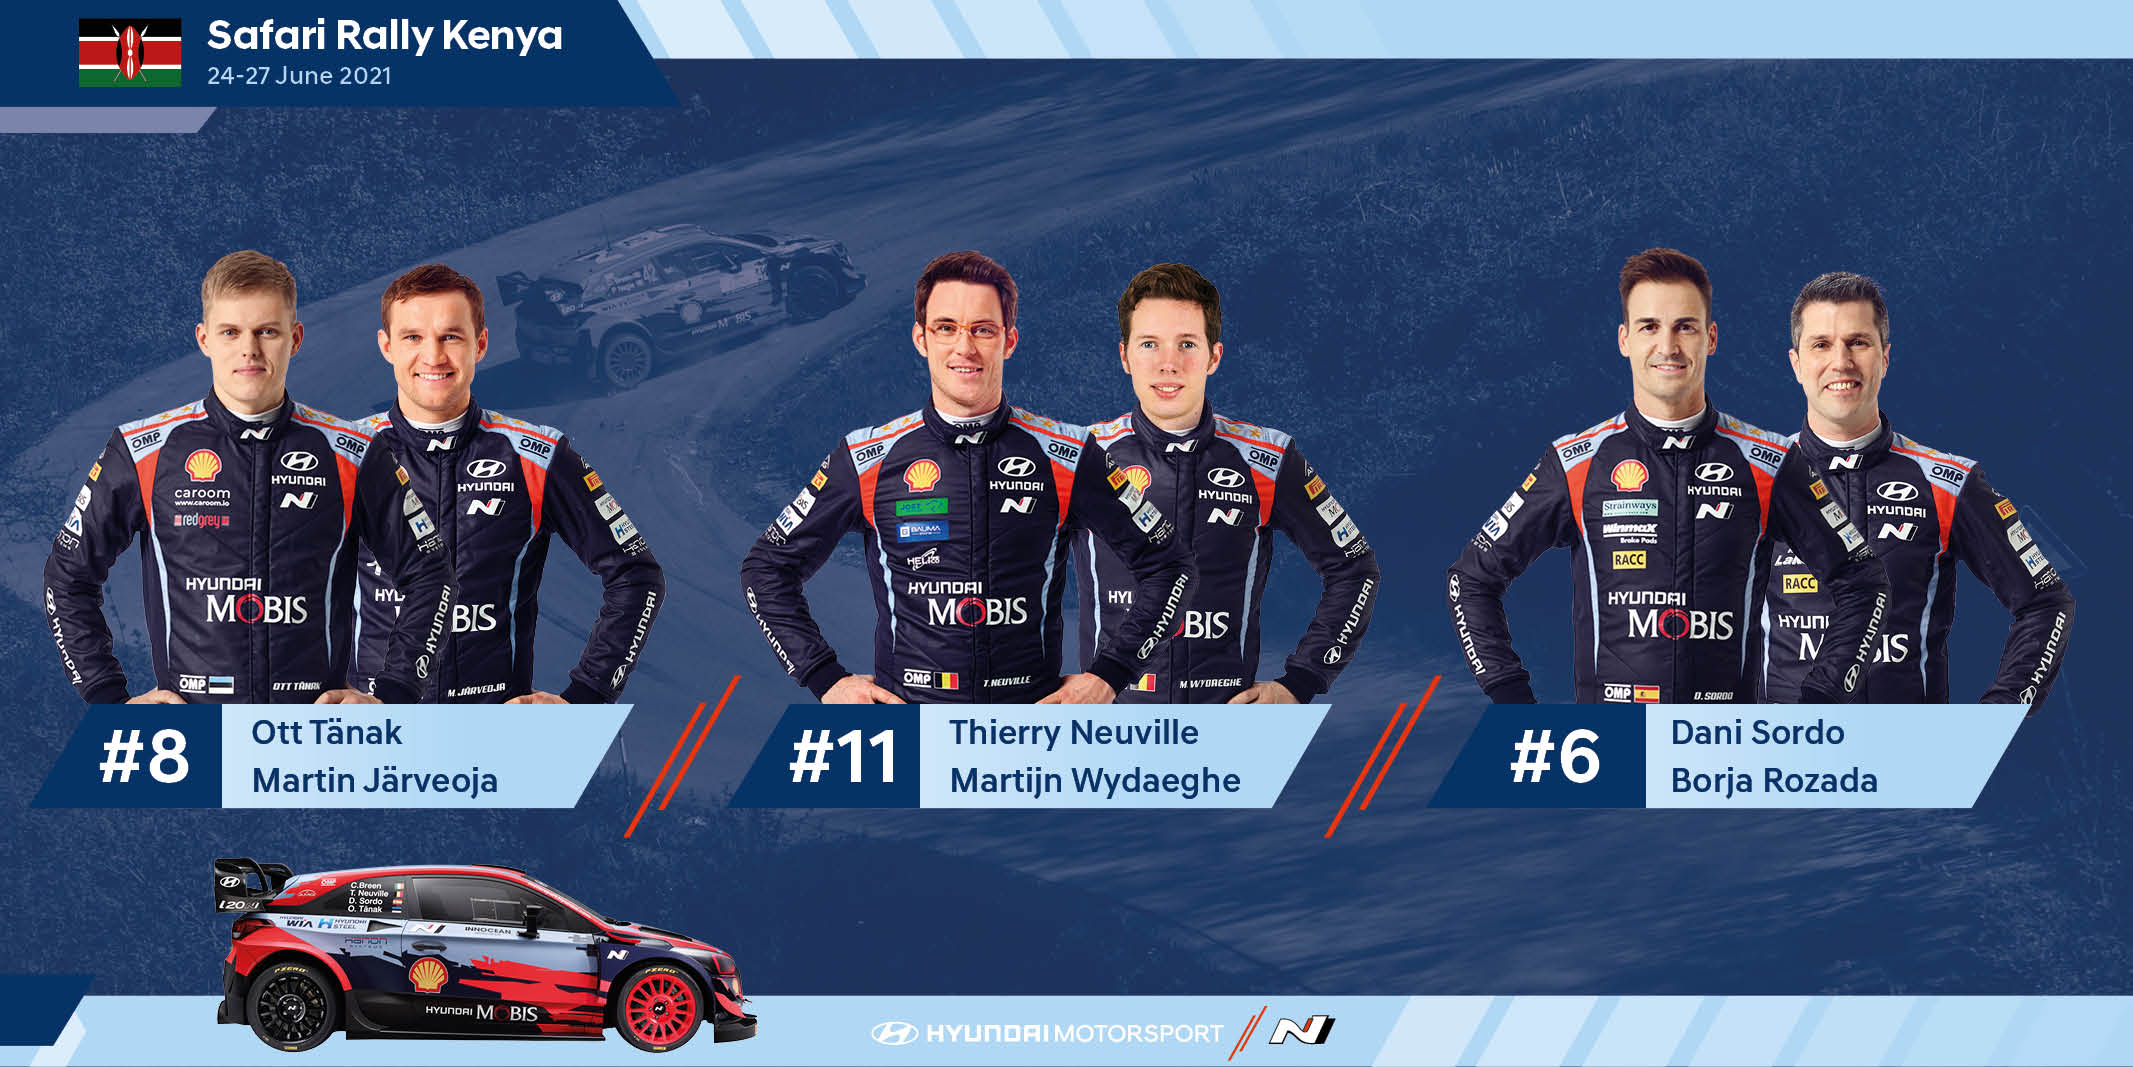 World Rally Championship: Temporada 2021  - Página 26 E1Q6tX4WEAYYGfQ?format=jpg&name=4096x4096